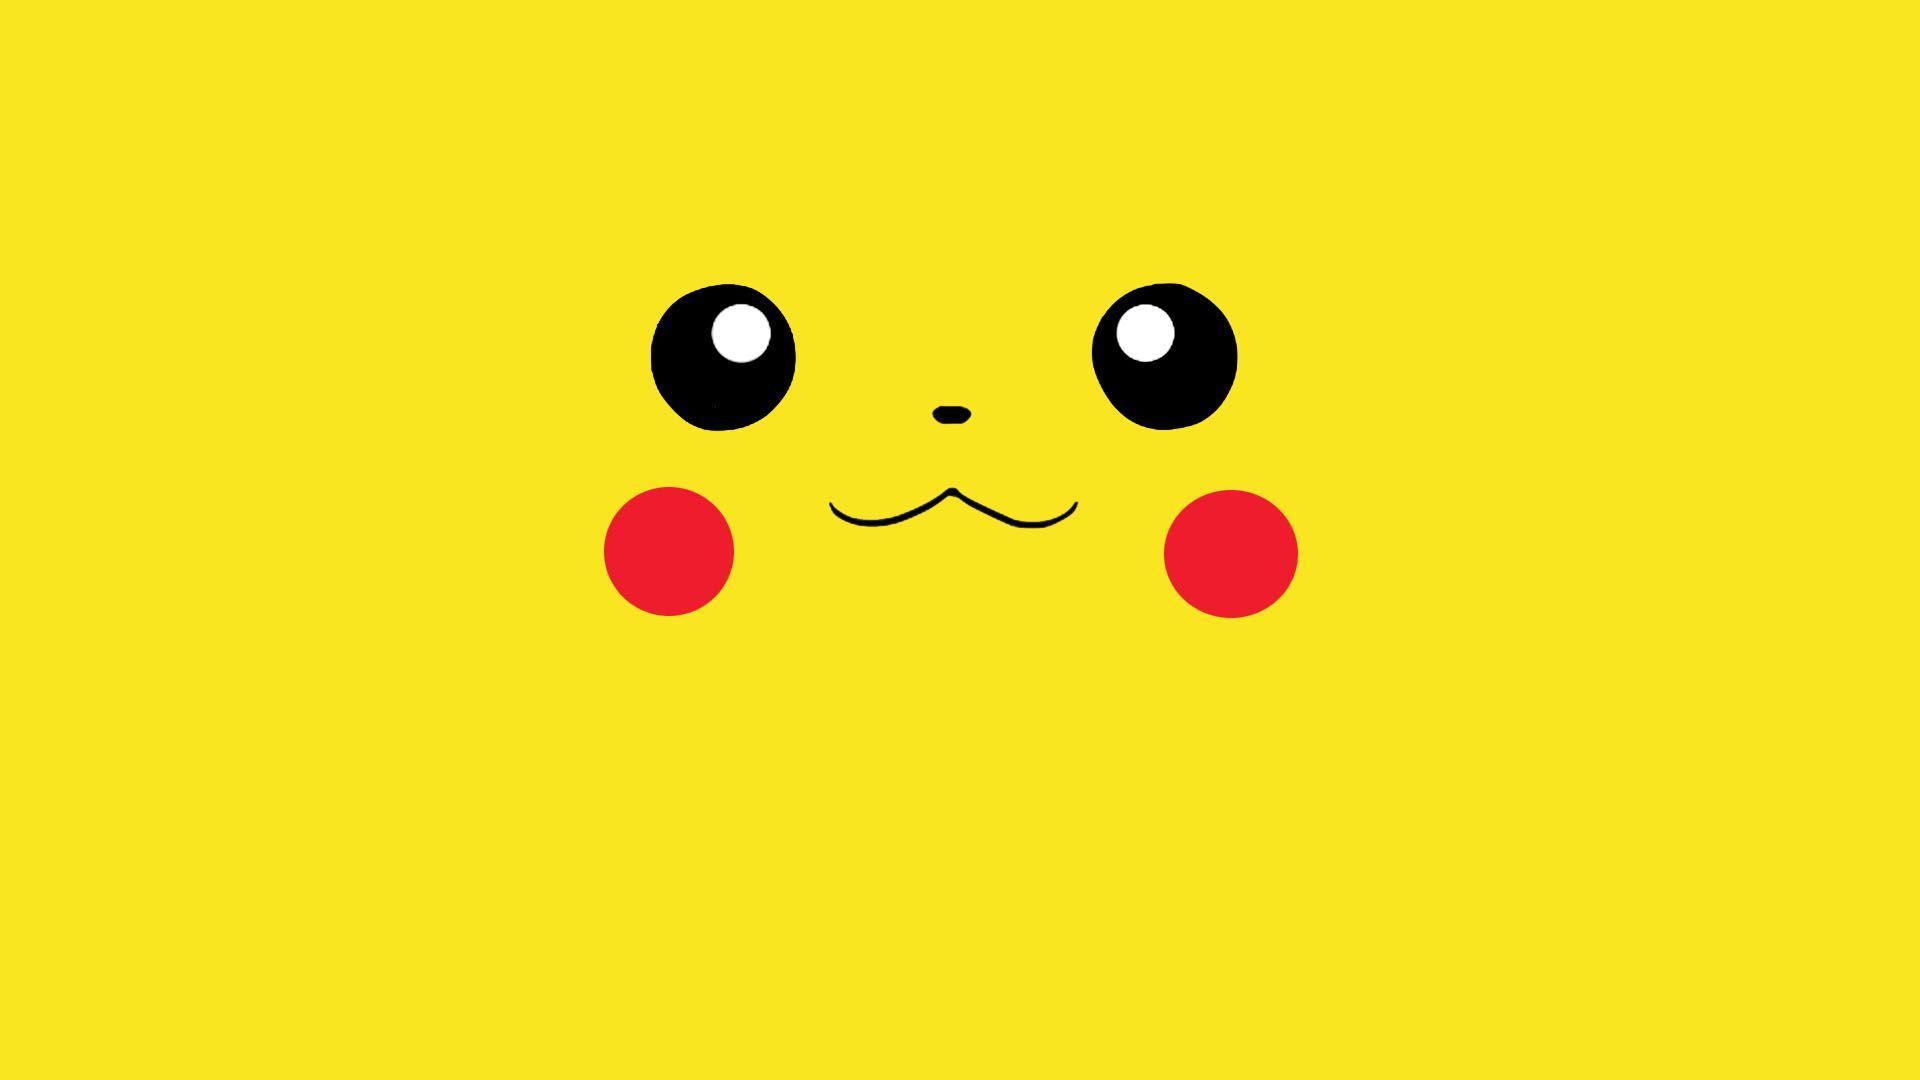 Detective pikachu wallpapers wallpaper cave - Kawaii wallpaper hd ...